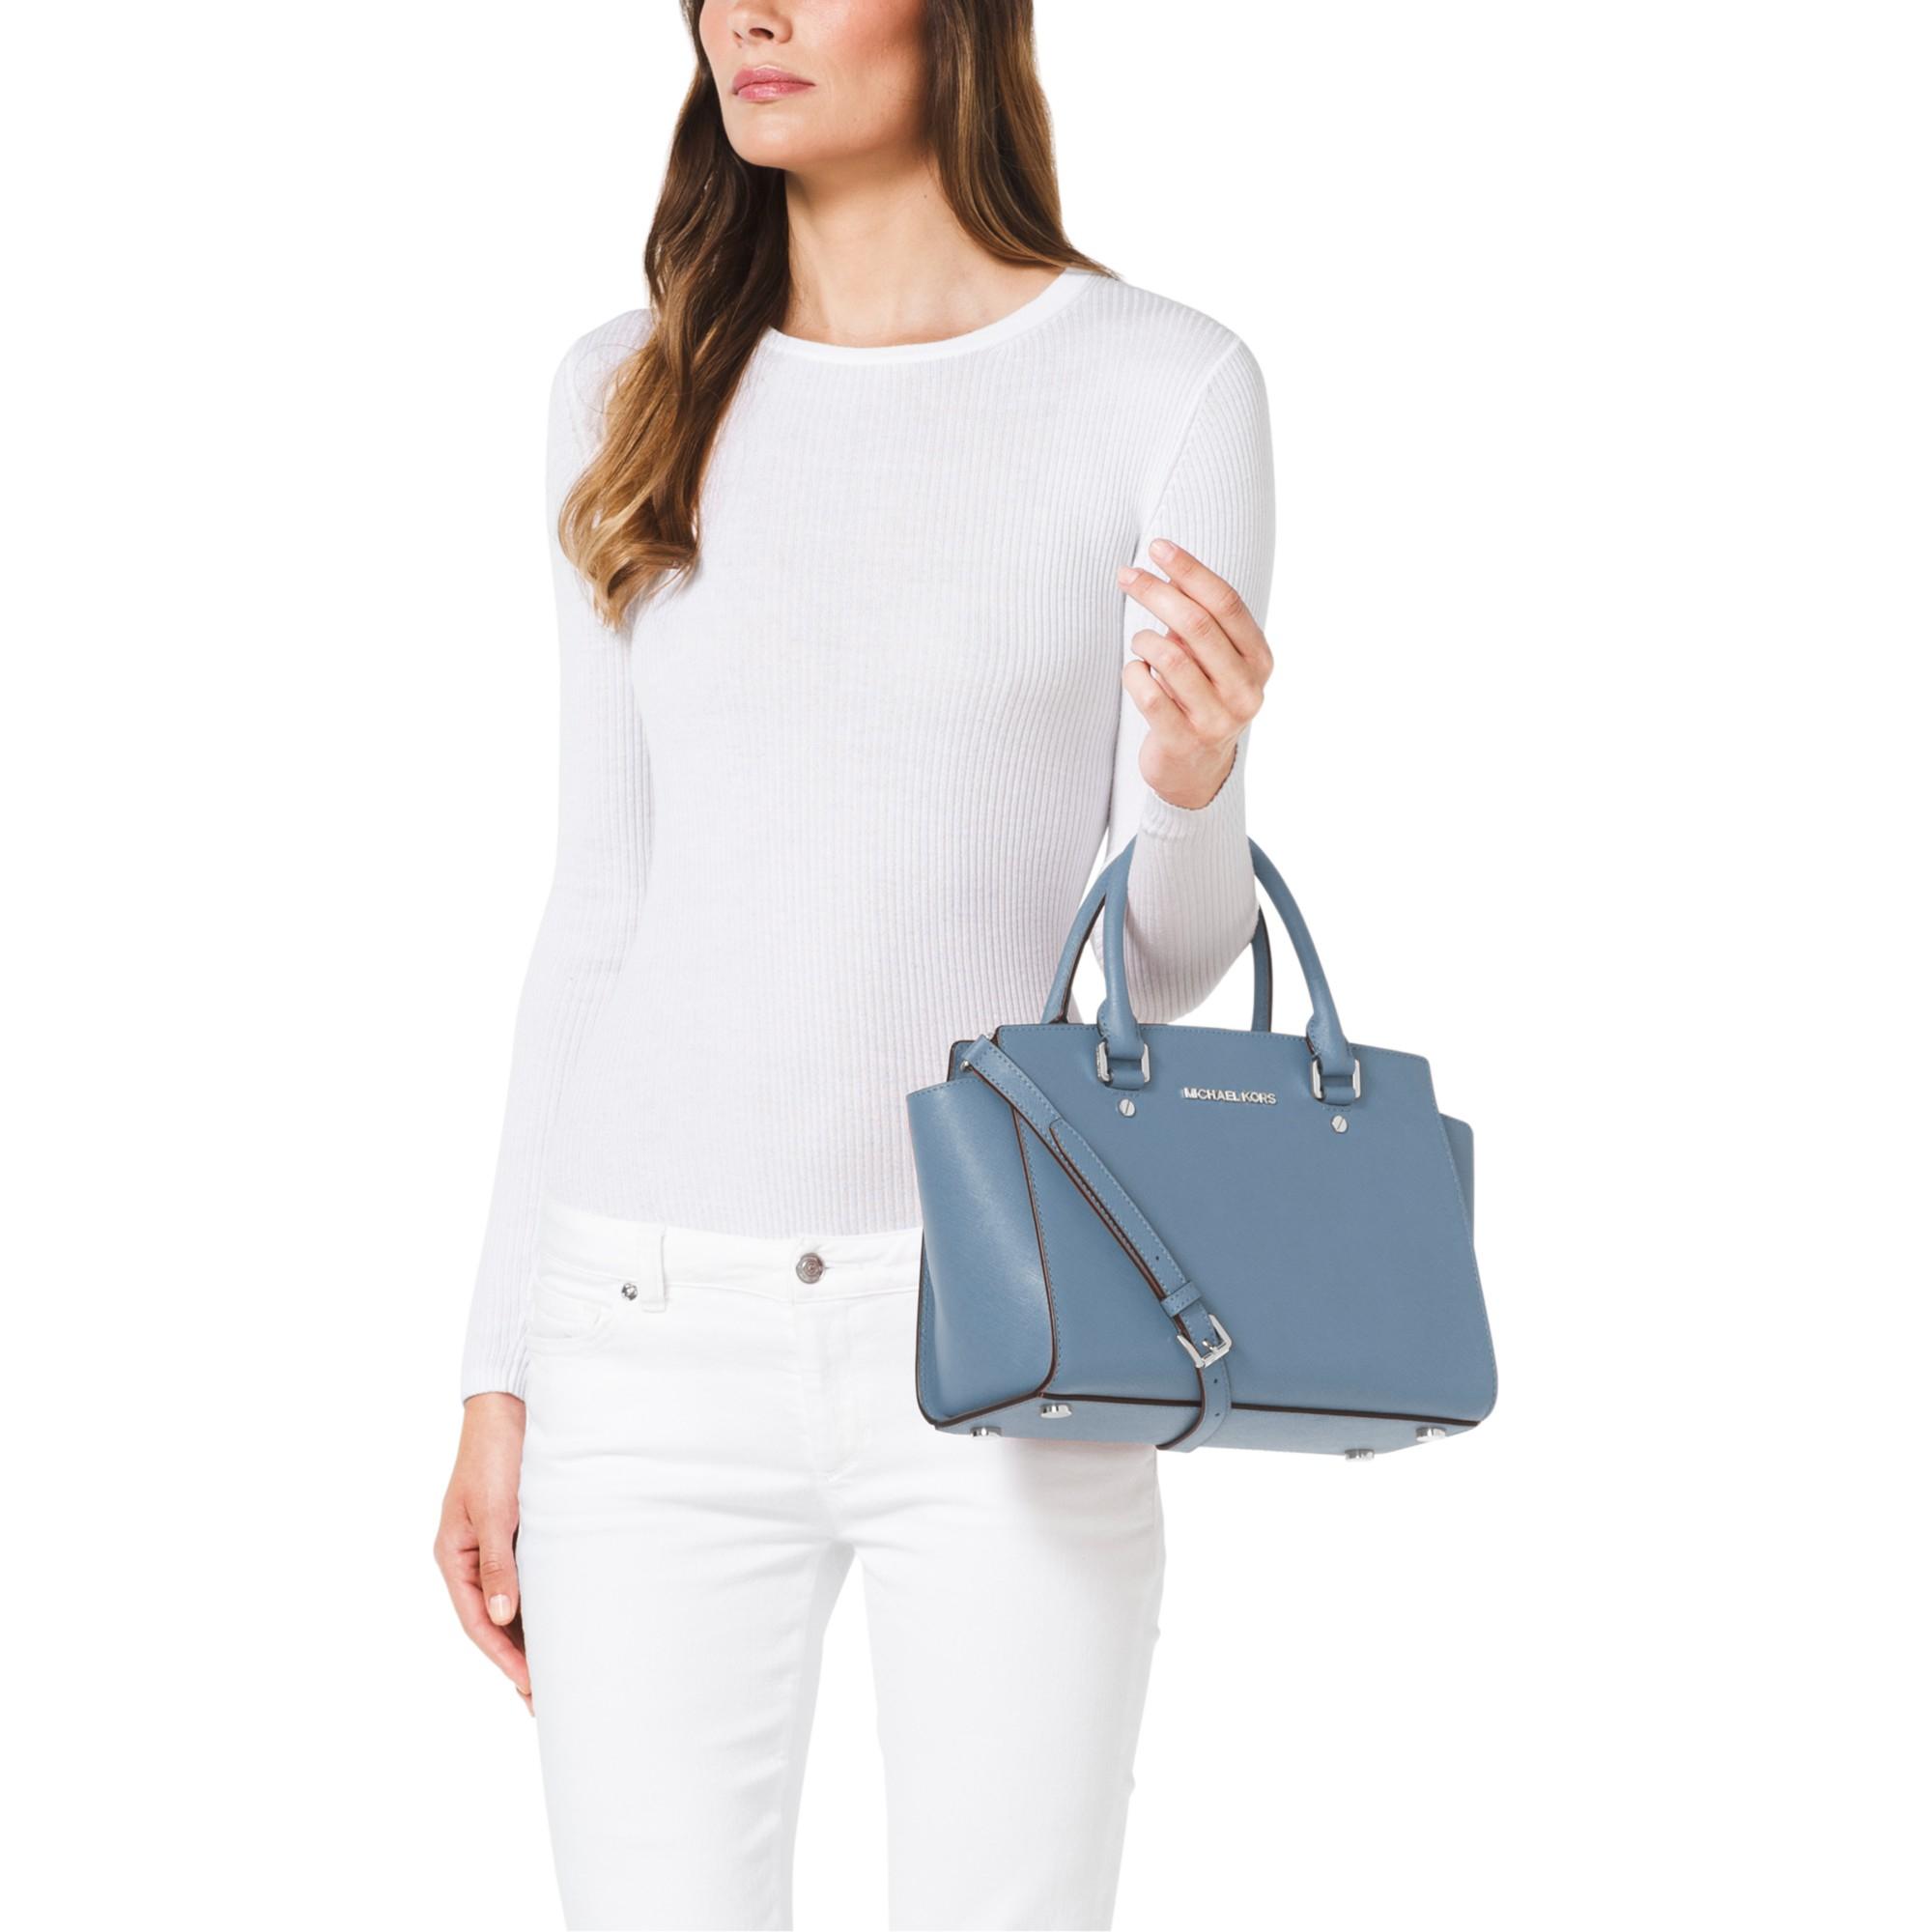 07f9bcfe5eeda3 MICHAEL Michael Kors Selma Medium Top Zip Leather Satchel in Blue - Lyst